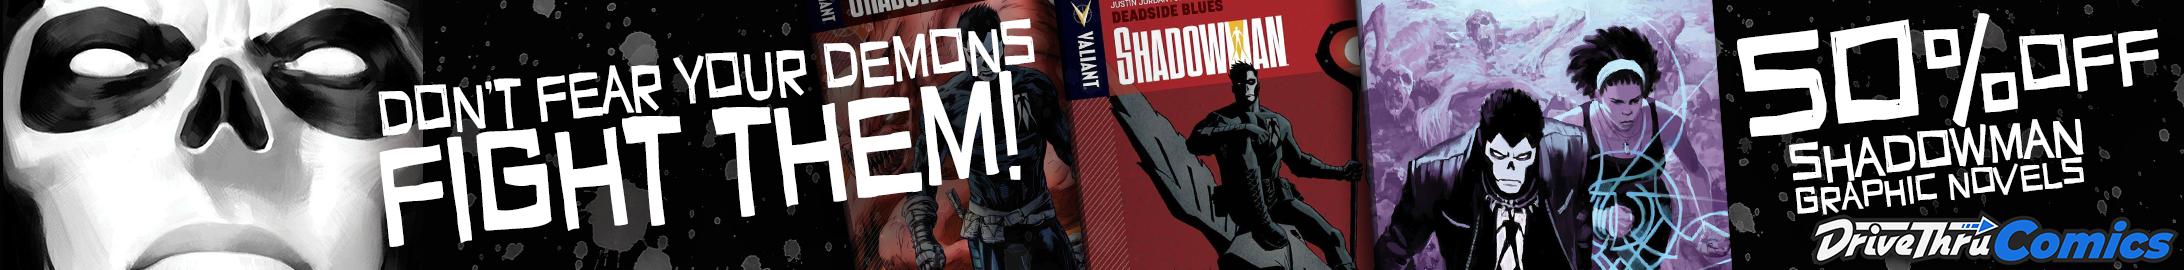 Shadowman graphic novels 50% off at @ DriveThruComics